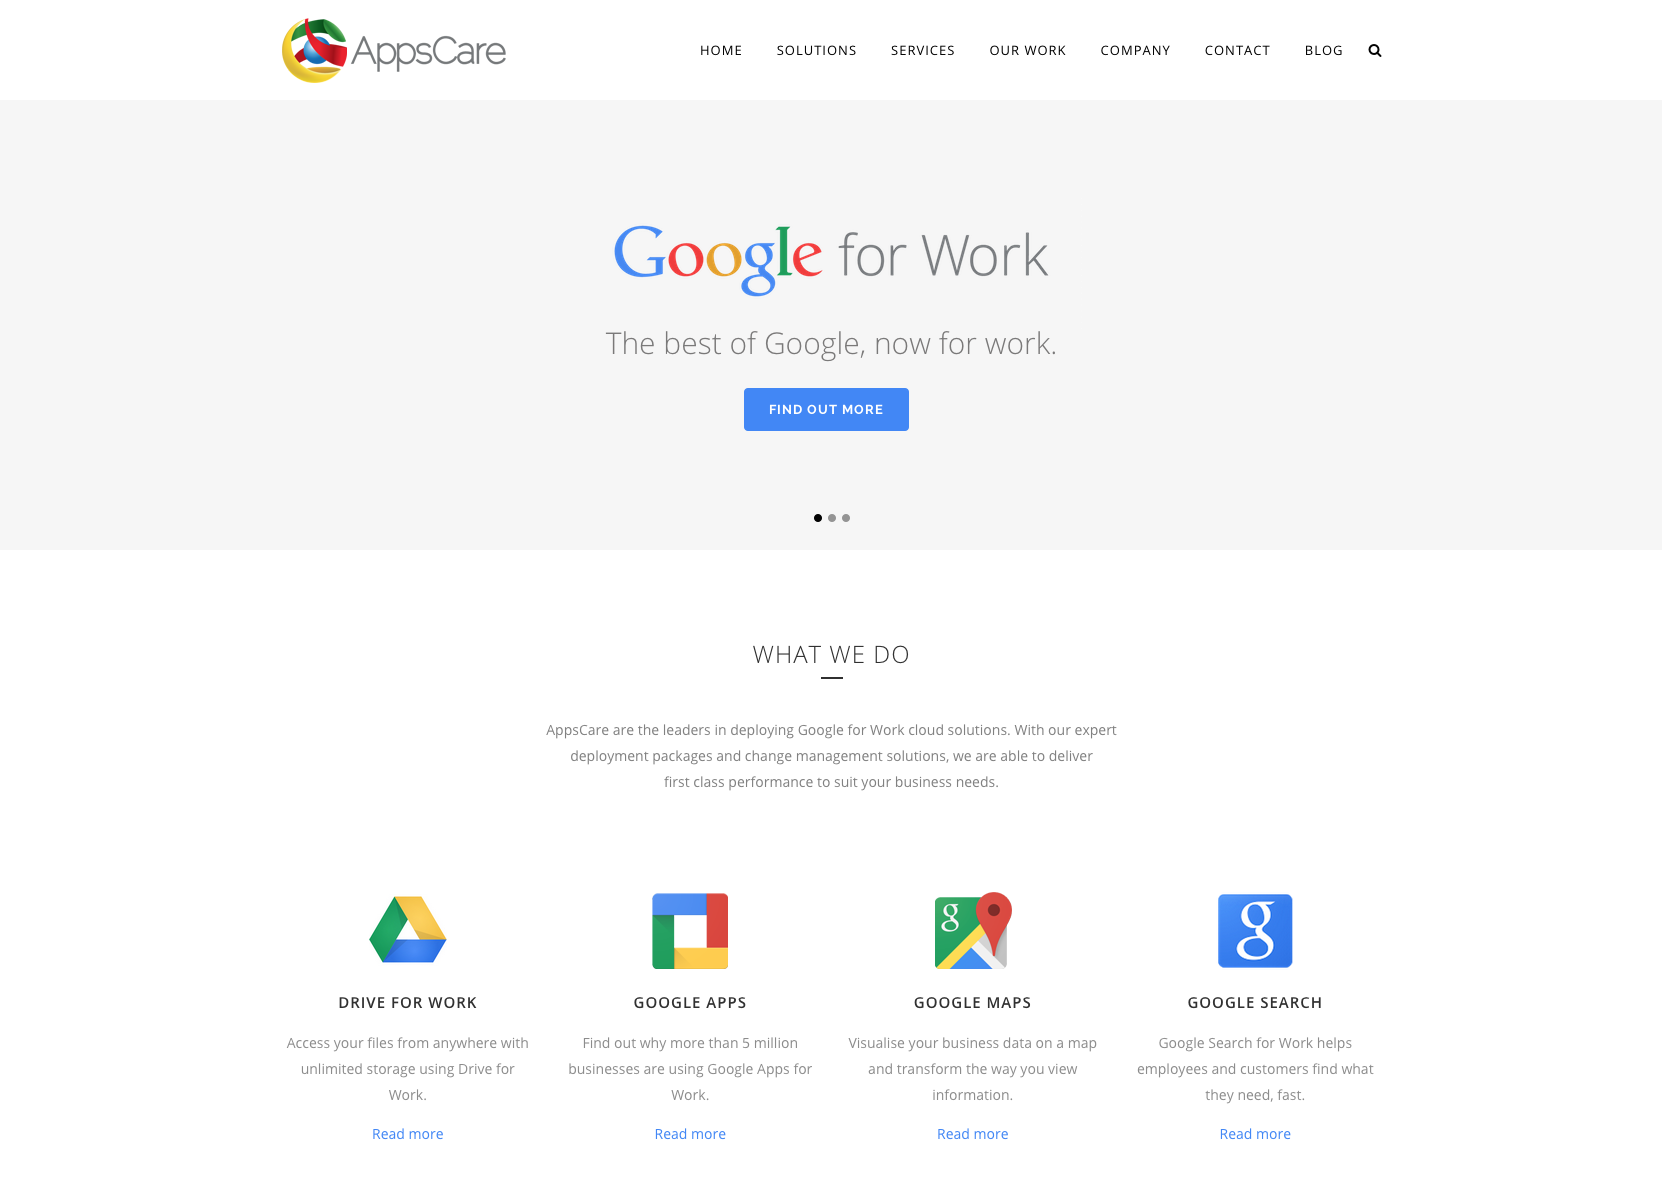 AppsCare website